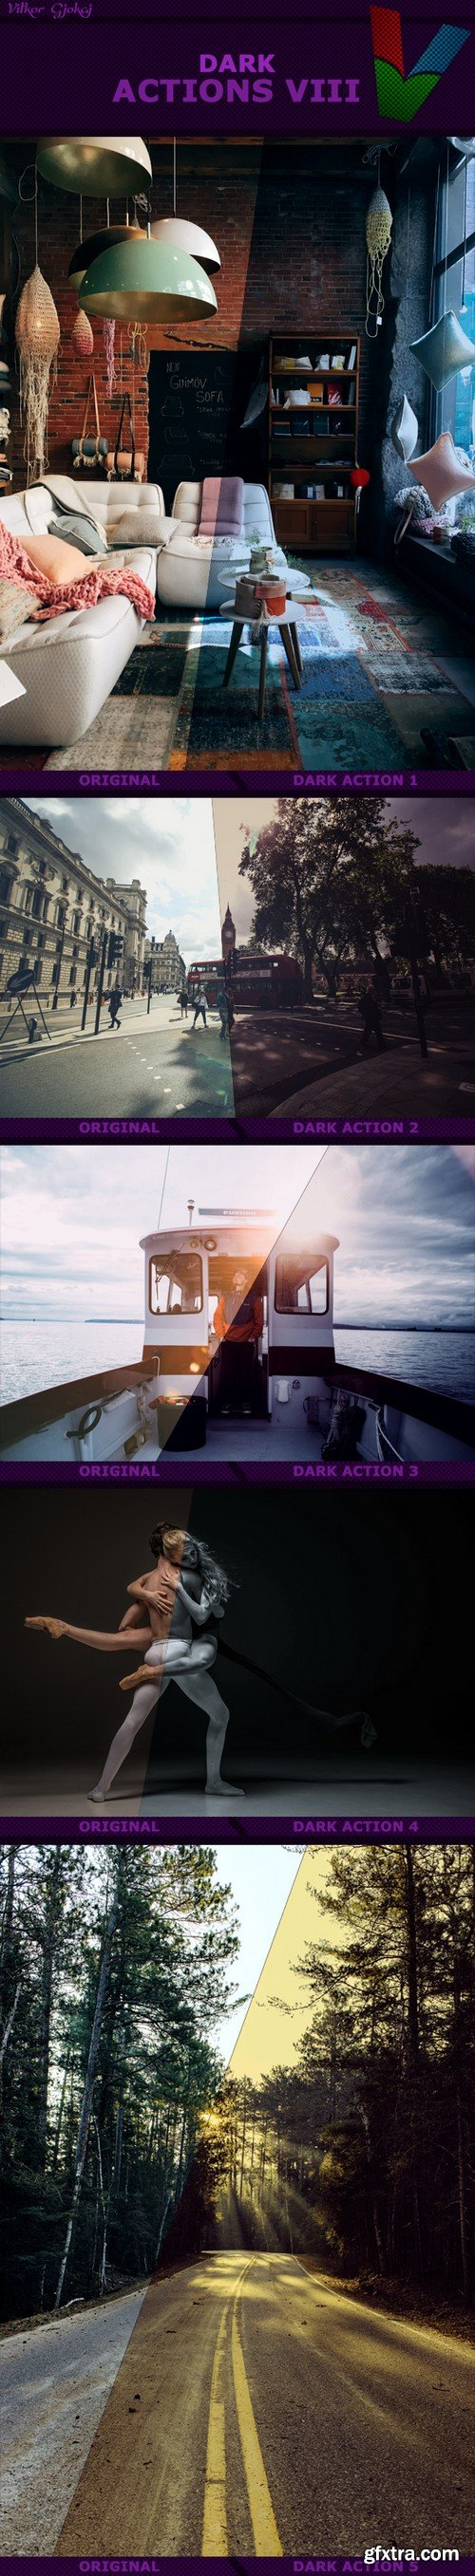 Graphicriver - Dark Actions VIII 17364903